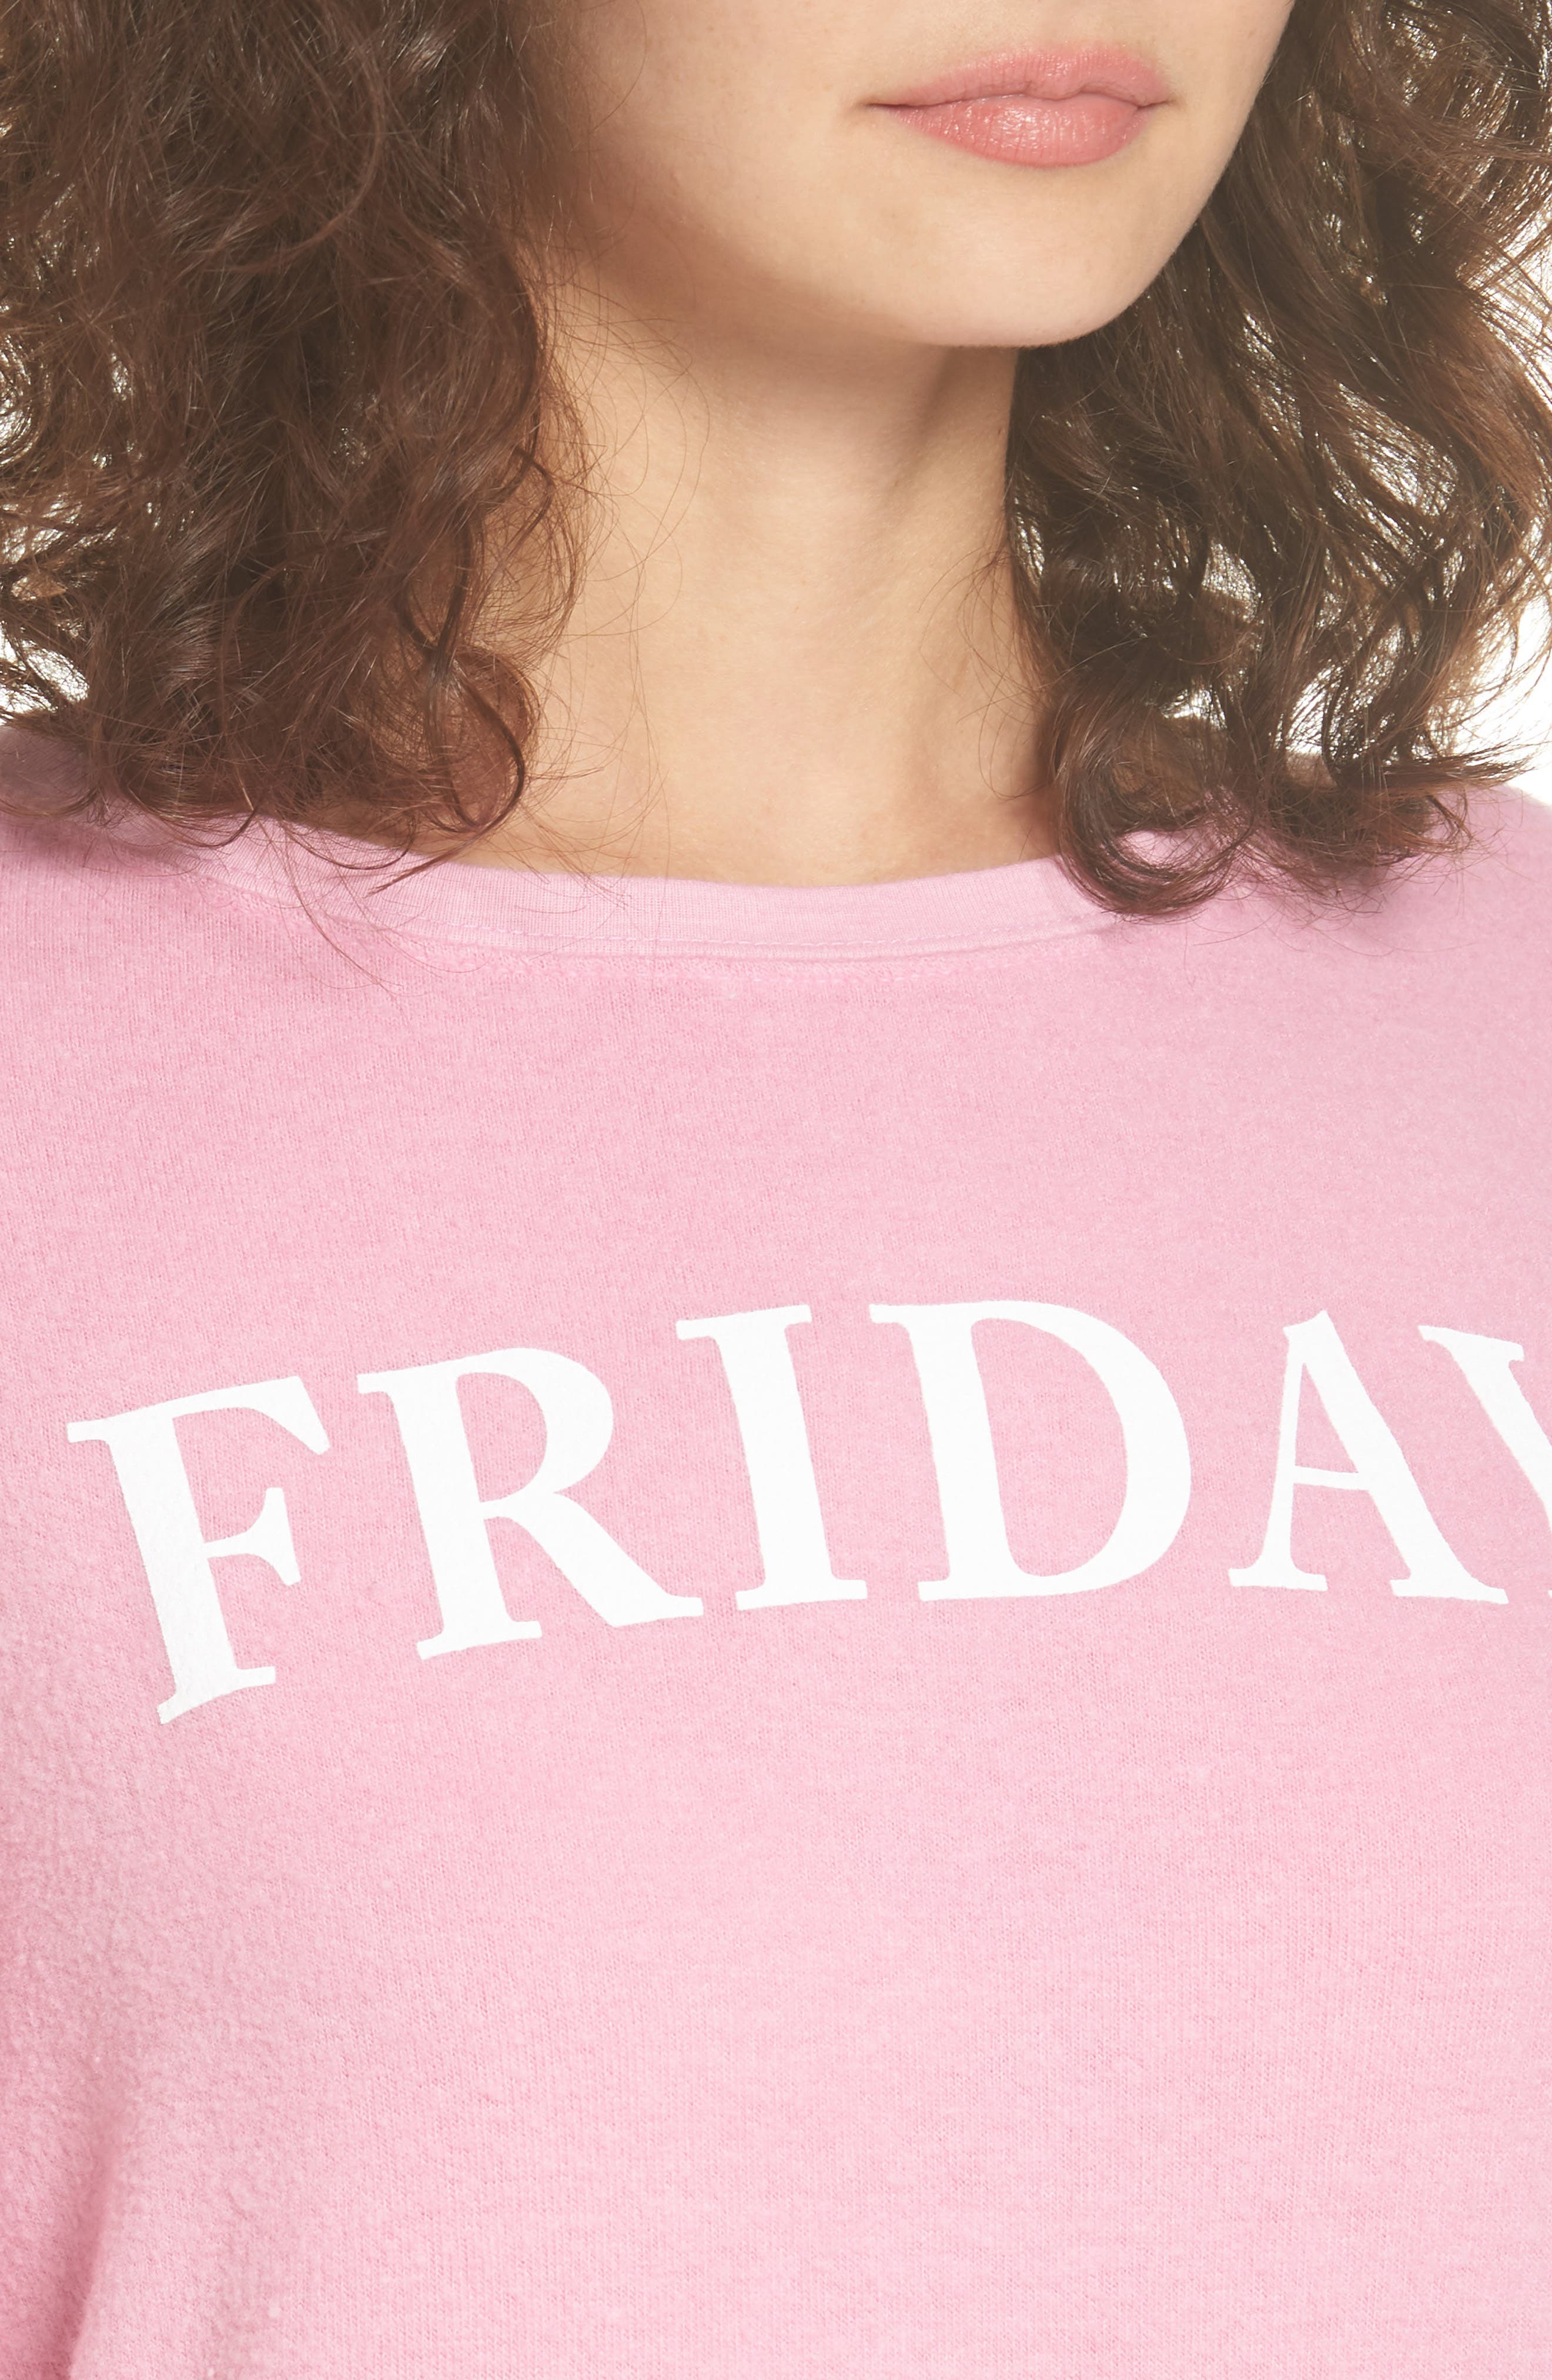 Friday Sweatshirt,                             Alternate thumbnail 4, color,                             650